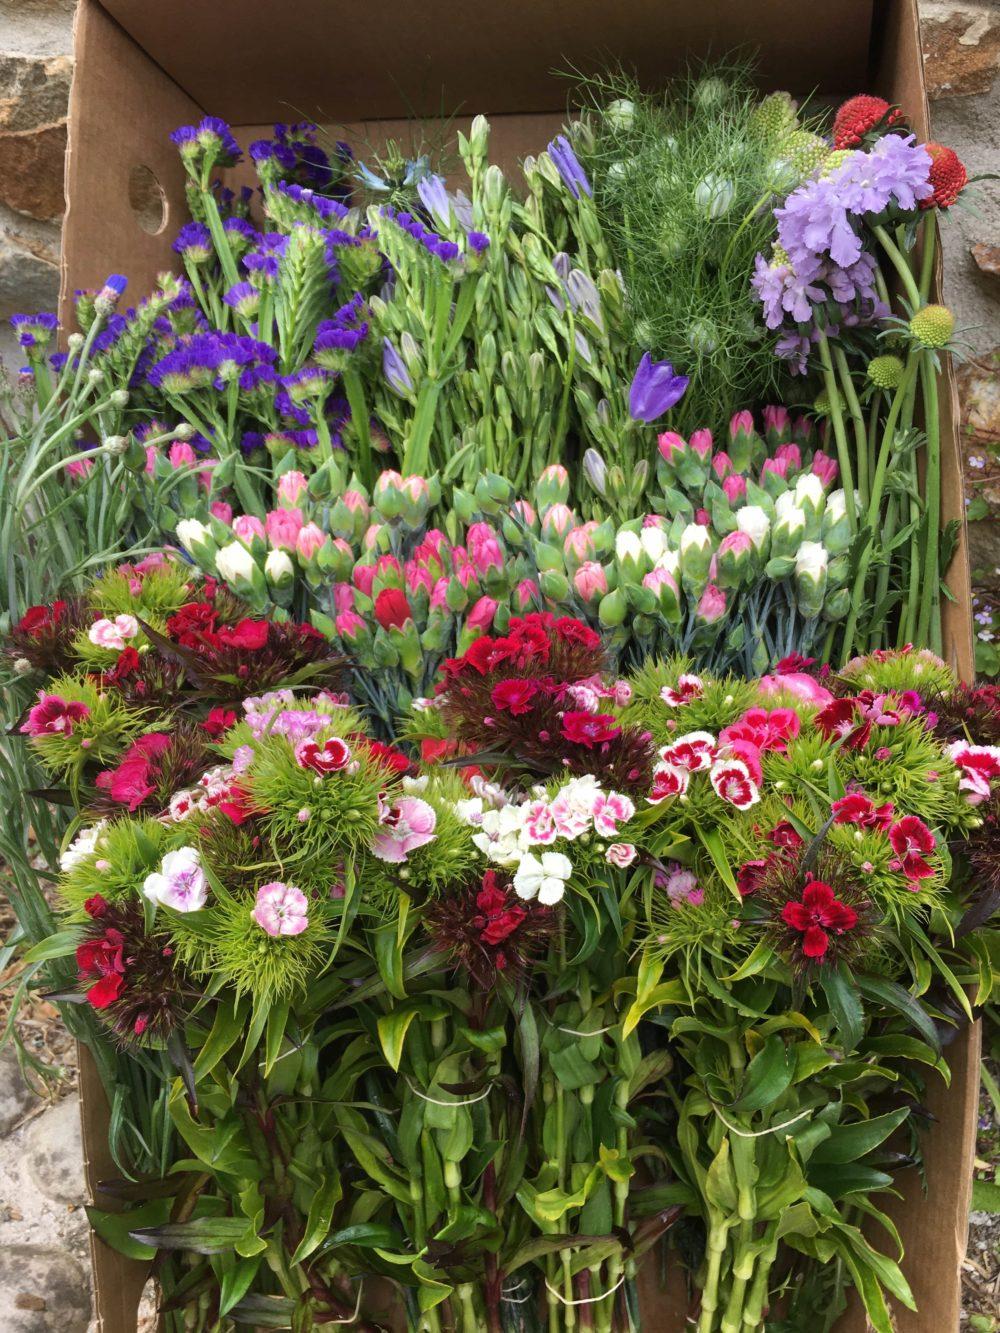 Diy Wedding Flowers.Party Or Diy Wedding Flowers